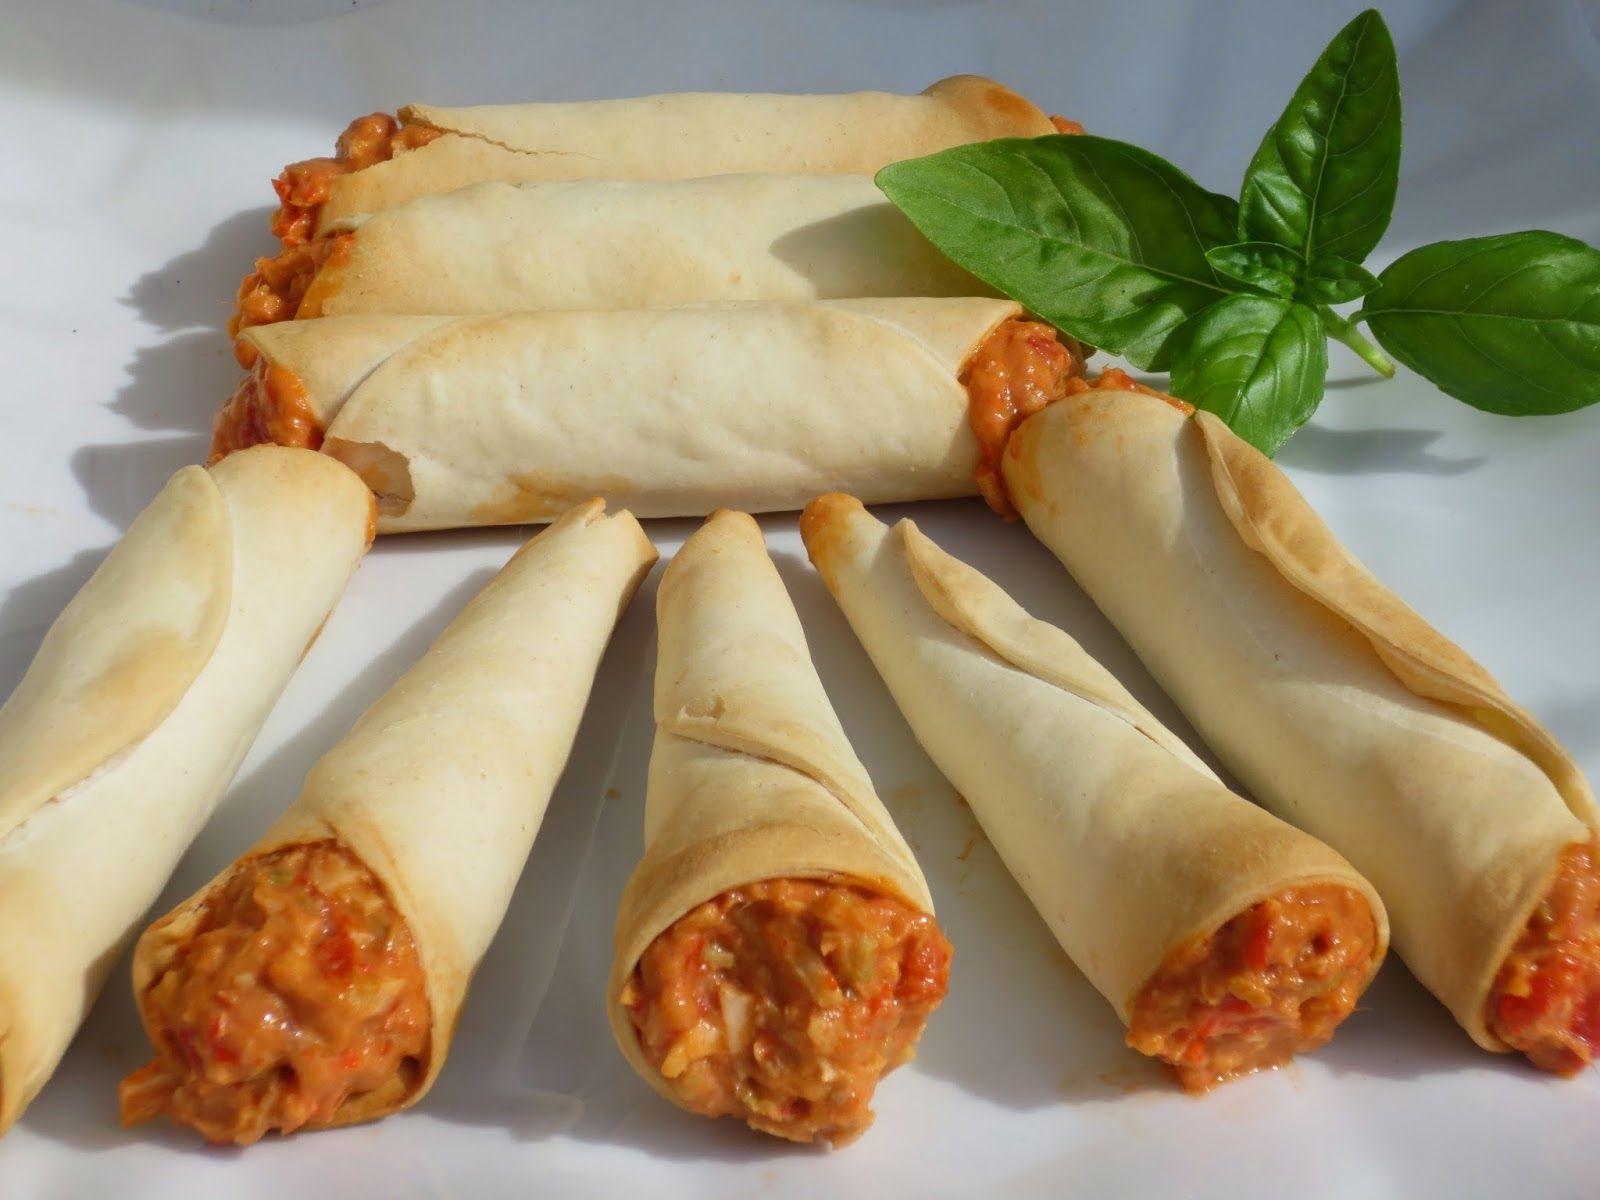 Blog con recetas sencillas r pidas y econ micas de thermomix realizadas por ana sevilla thermomix - Ana cocina facil ...